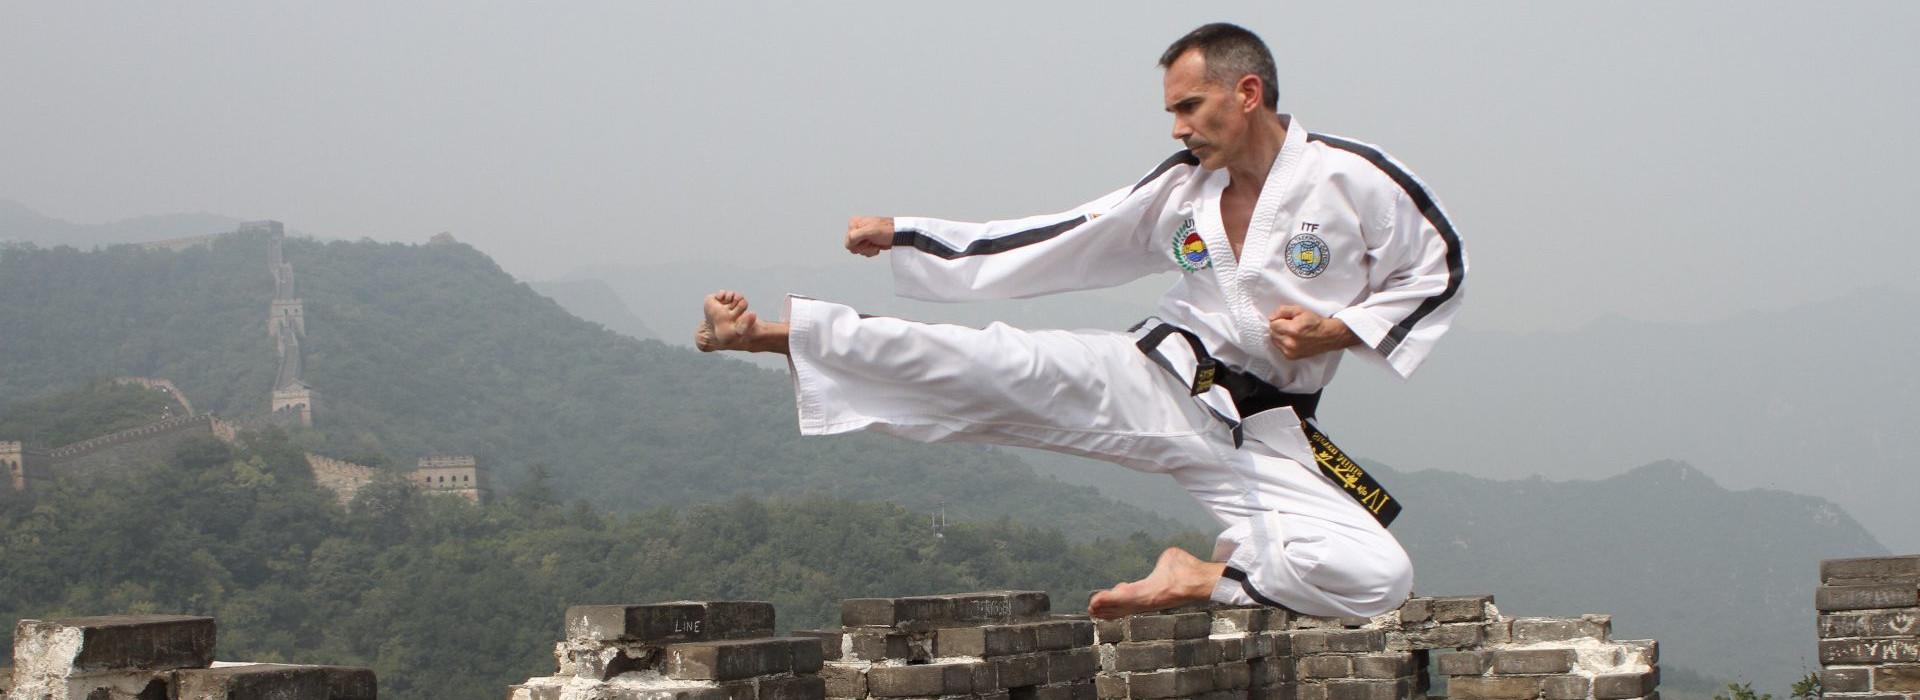 Master Millis on China Wall